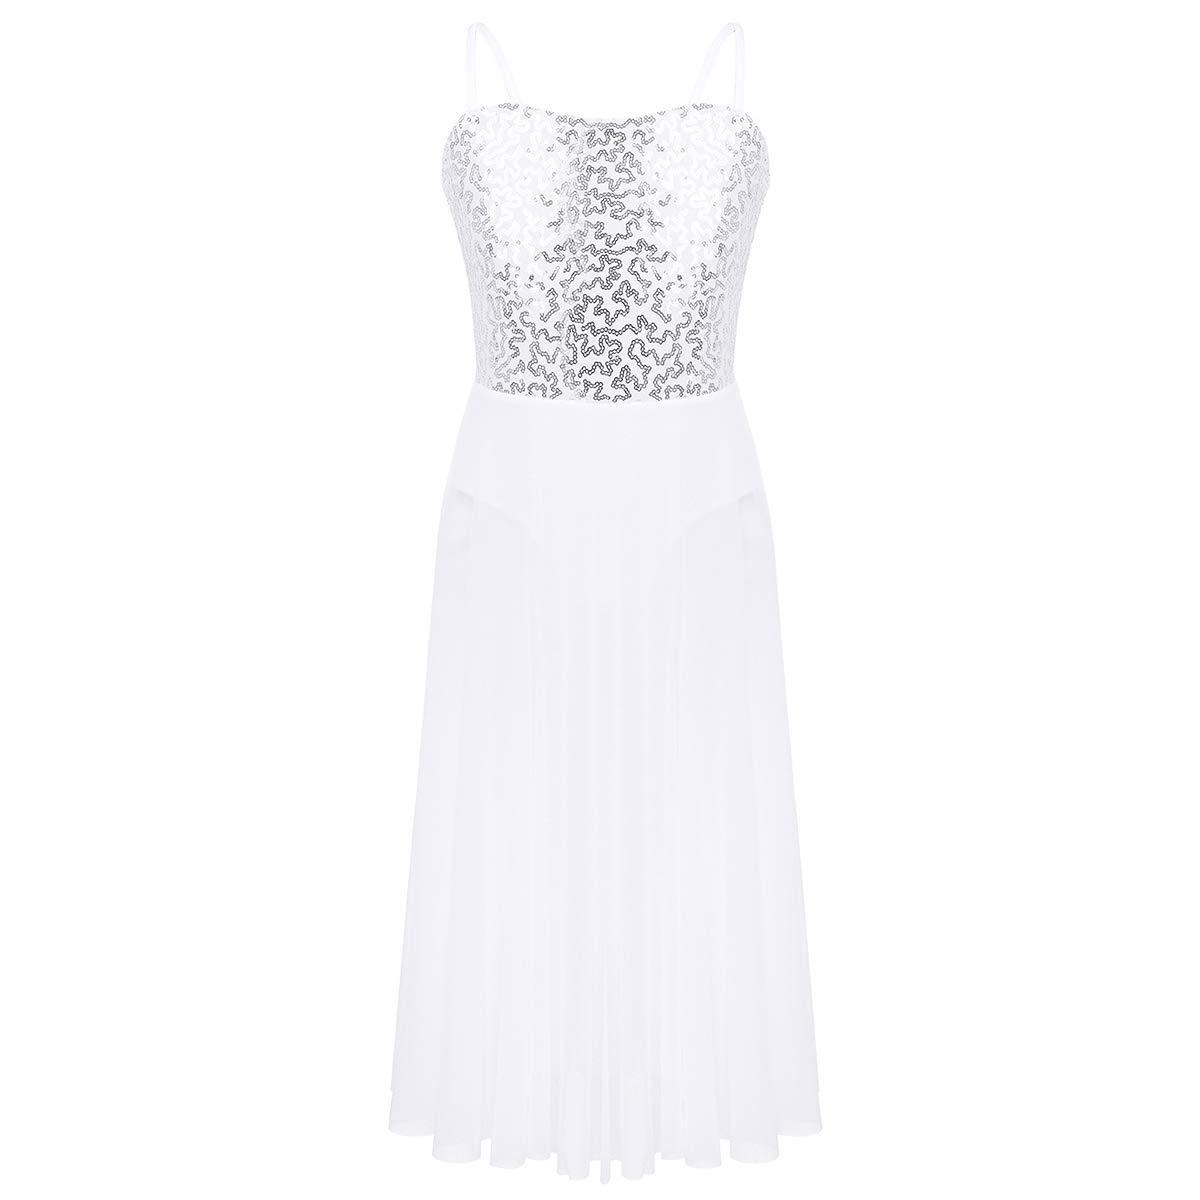 dPois Kids Girls Sequined Lyrical Modern Dance Dress Costume Outfit Double Criss Cross Strap Stunning Tank Leotard Tulle Maxi Skirt